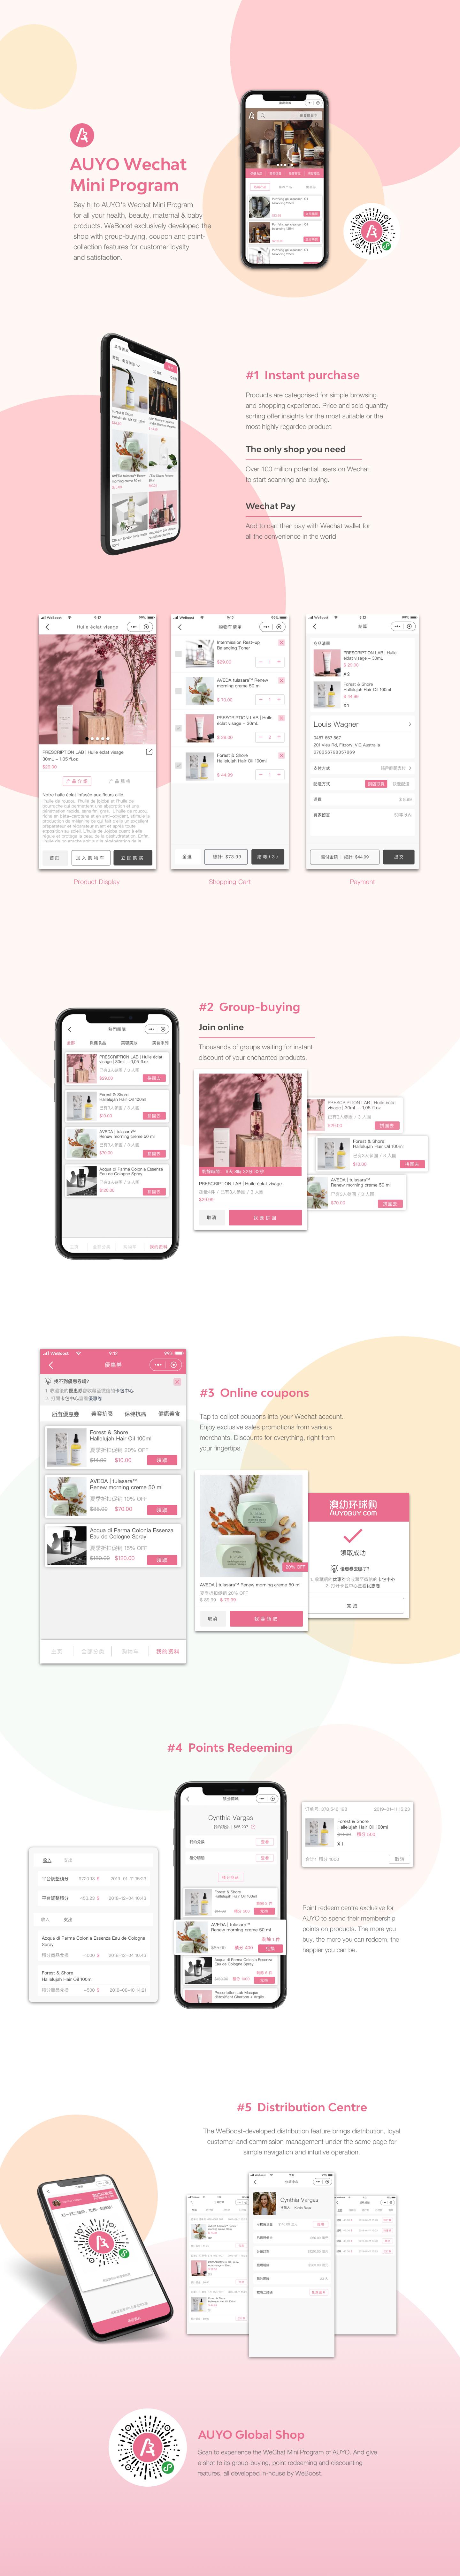 Infograph of AUYO WeChat mini program